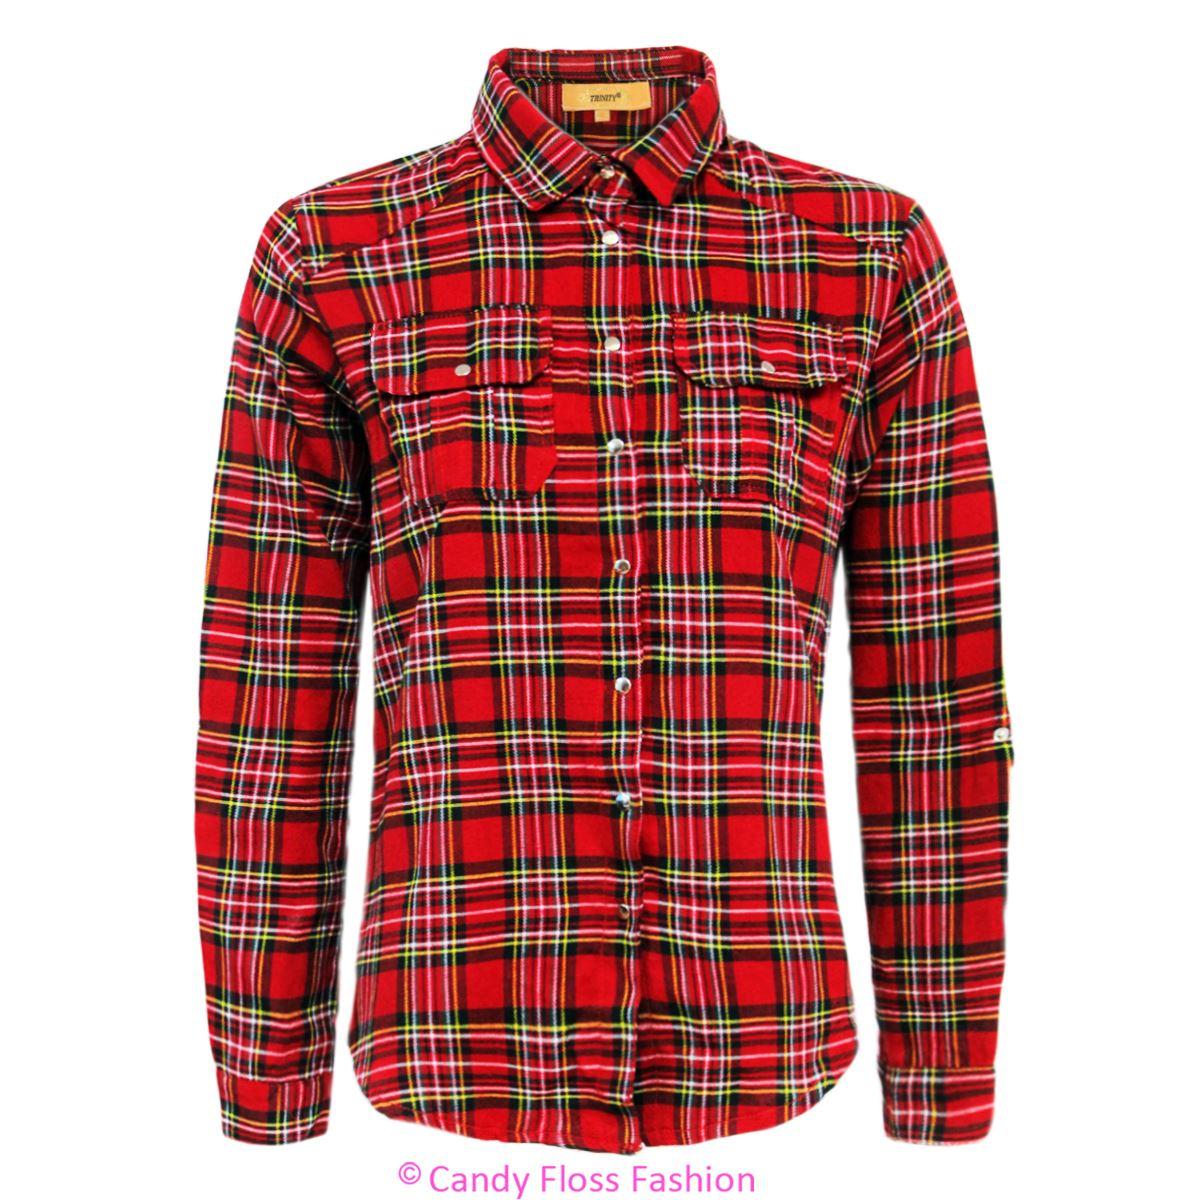 Ladies Womens Check Tartan Shirt Long Sleeve Button Down